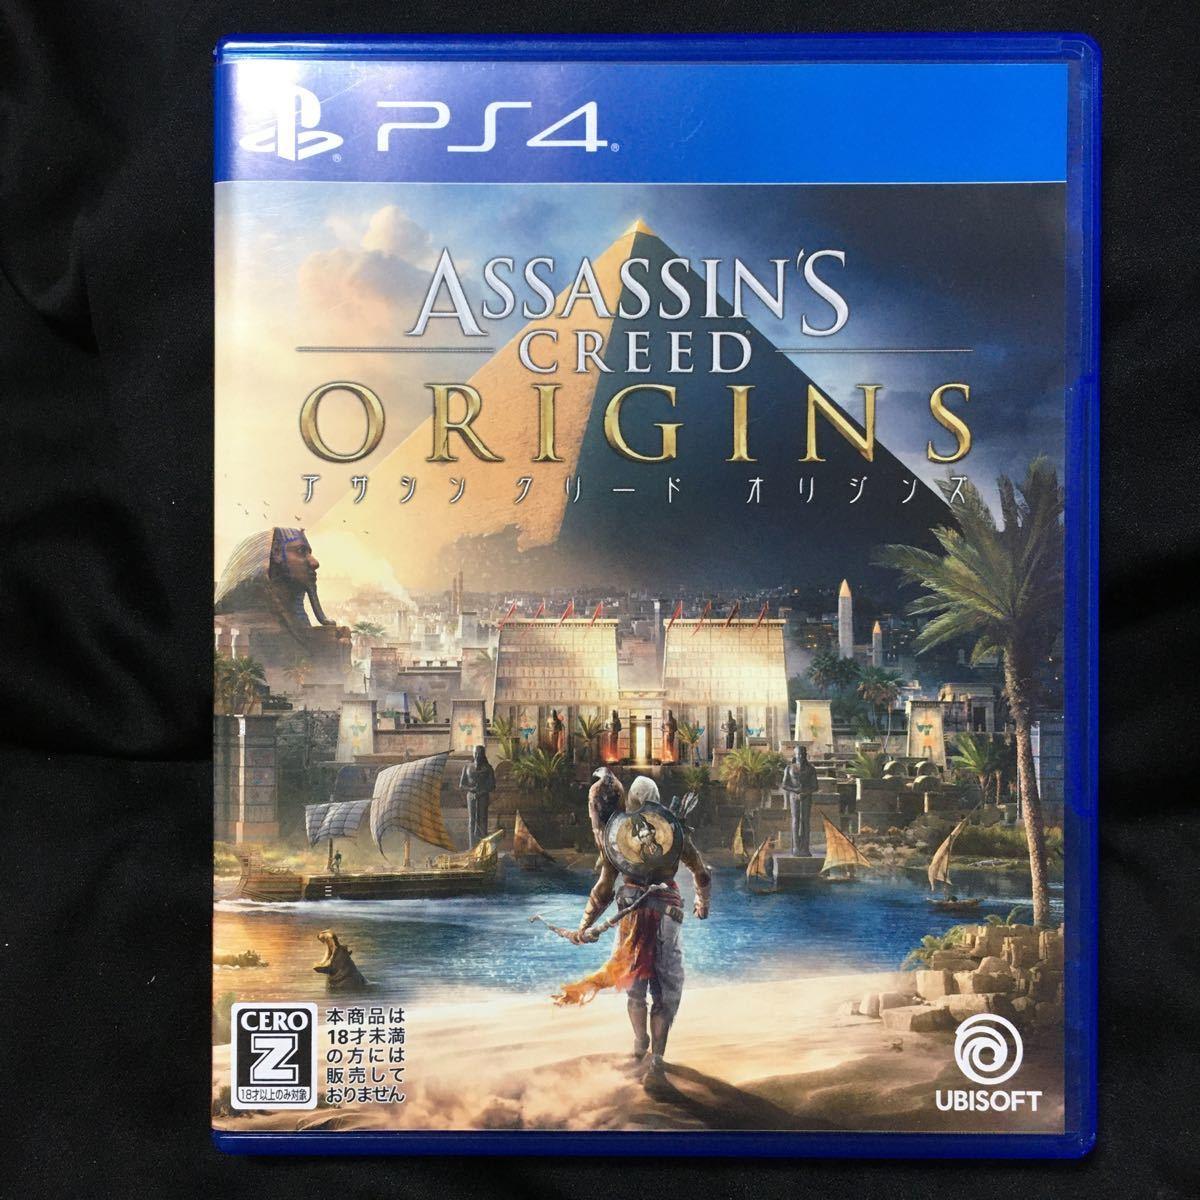 【PS4】 アサシン クリード オリジンズ [通常版]送料無料、匿名配送、当日発送可能♪